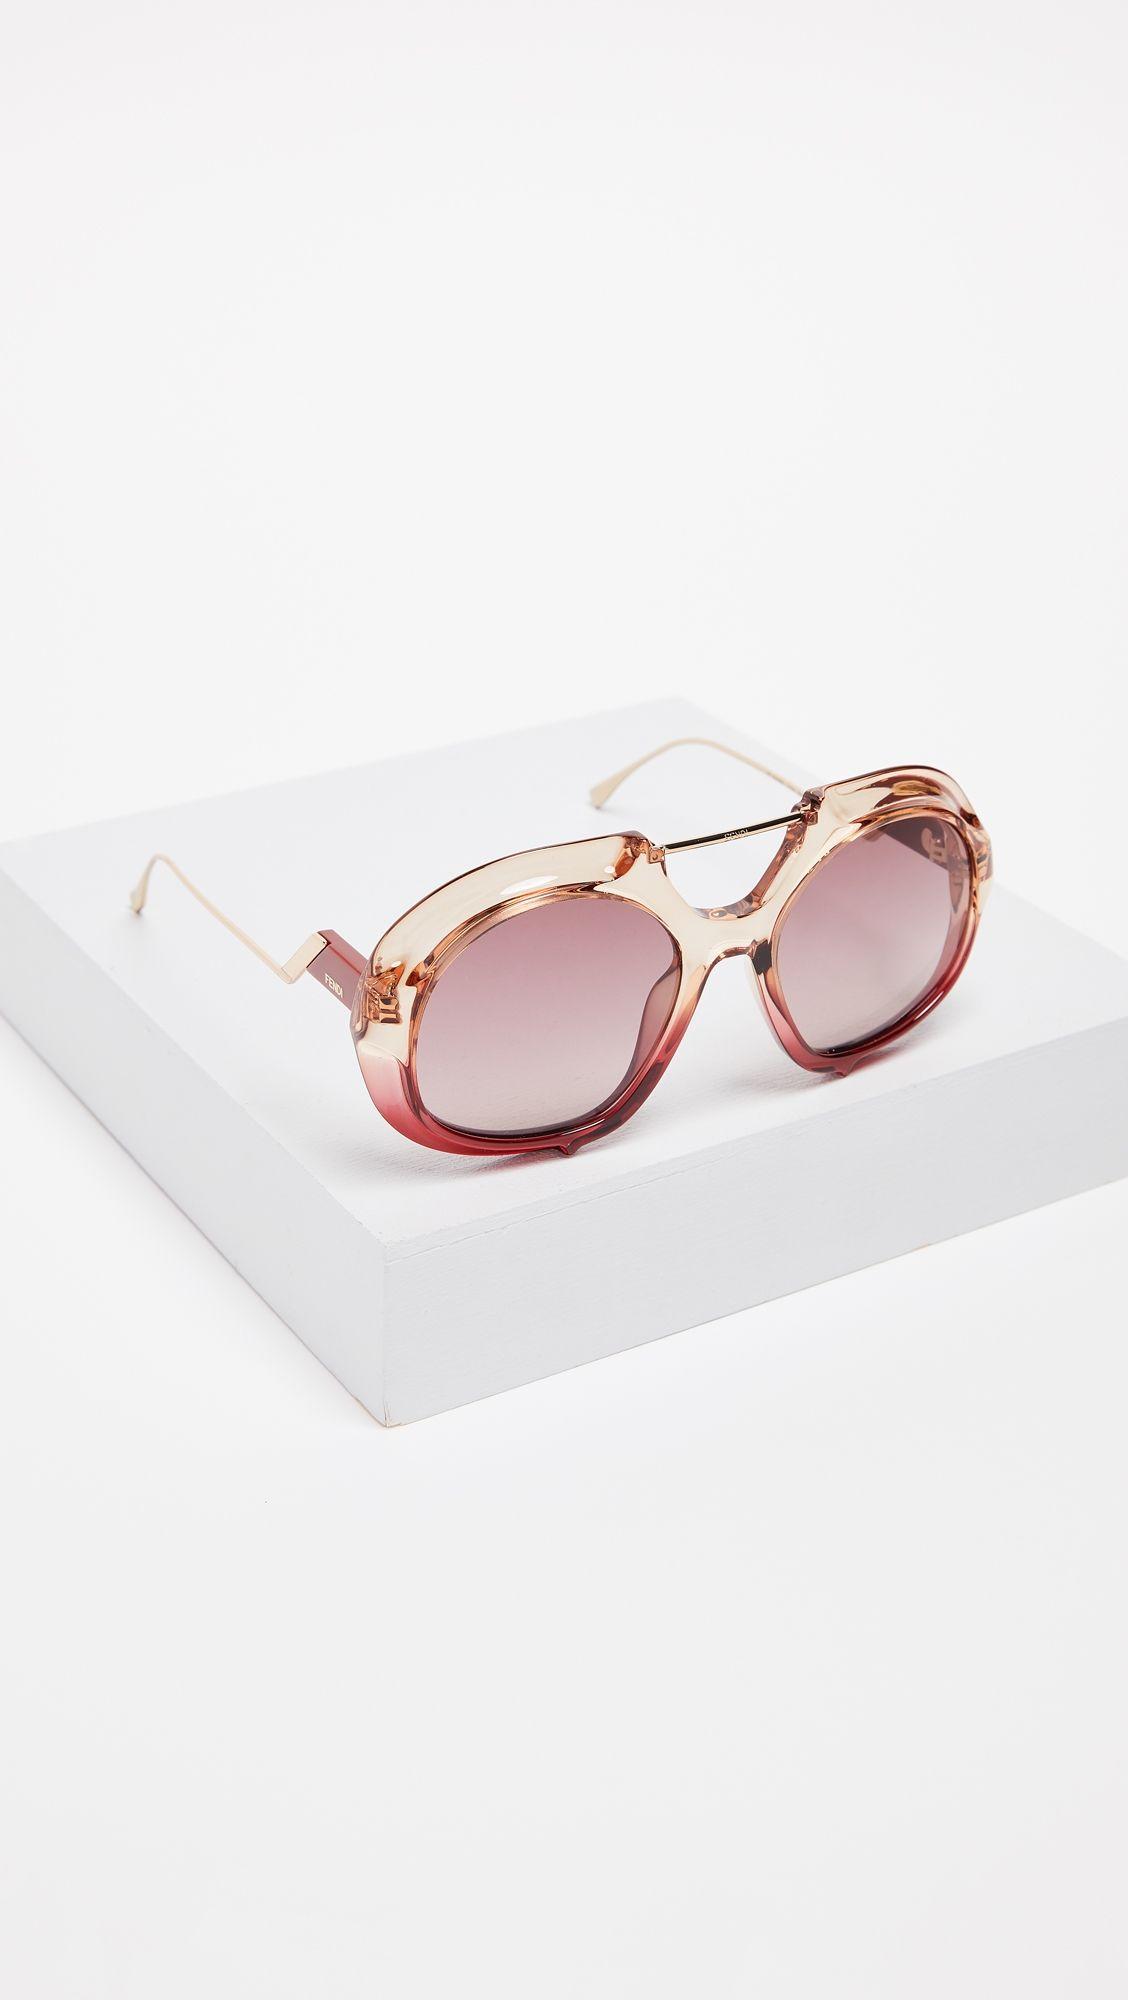 b53cc564fa Fendi Thick Aviator Sunglasses